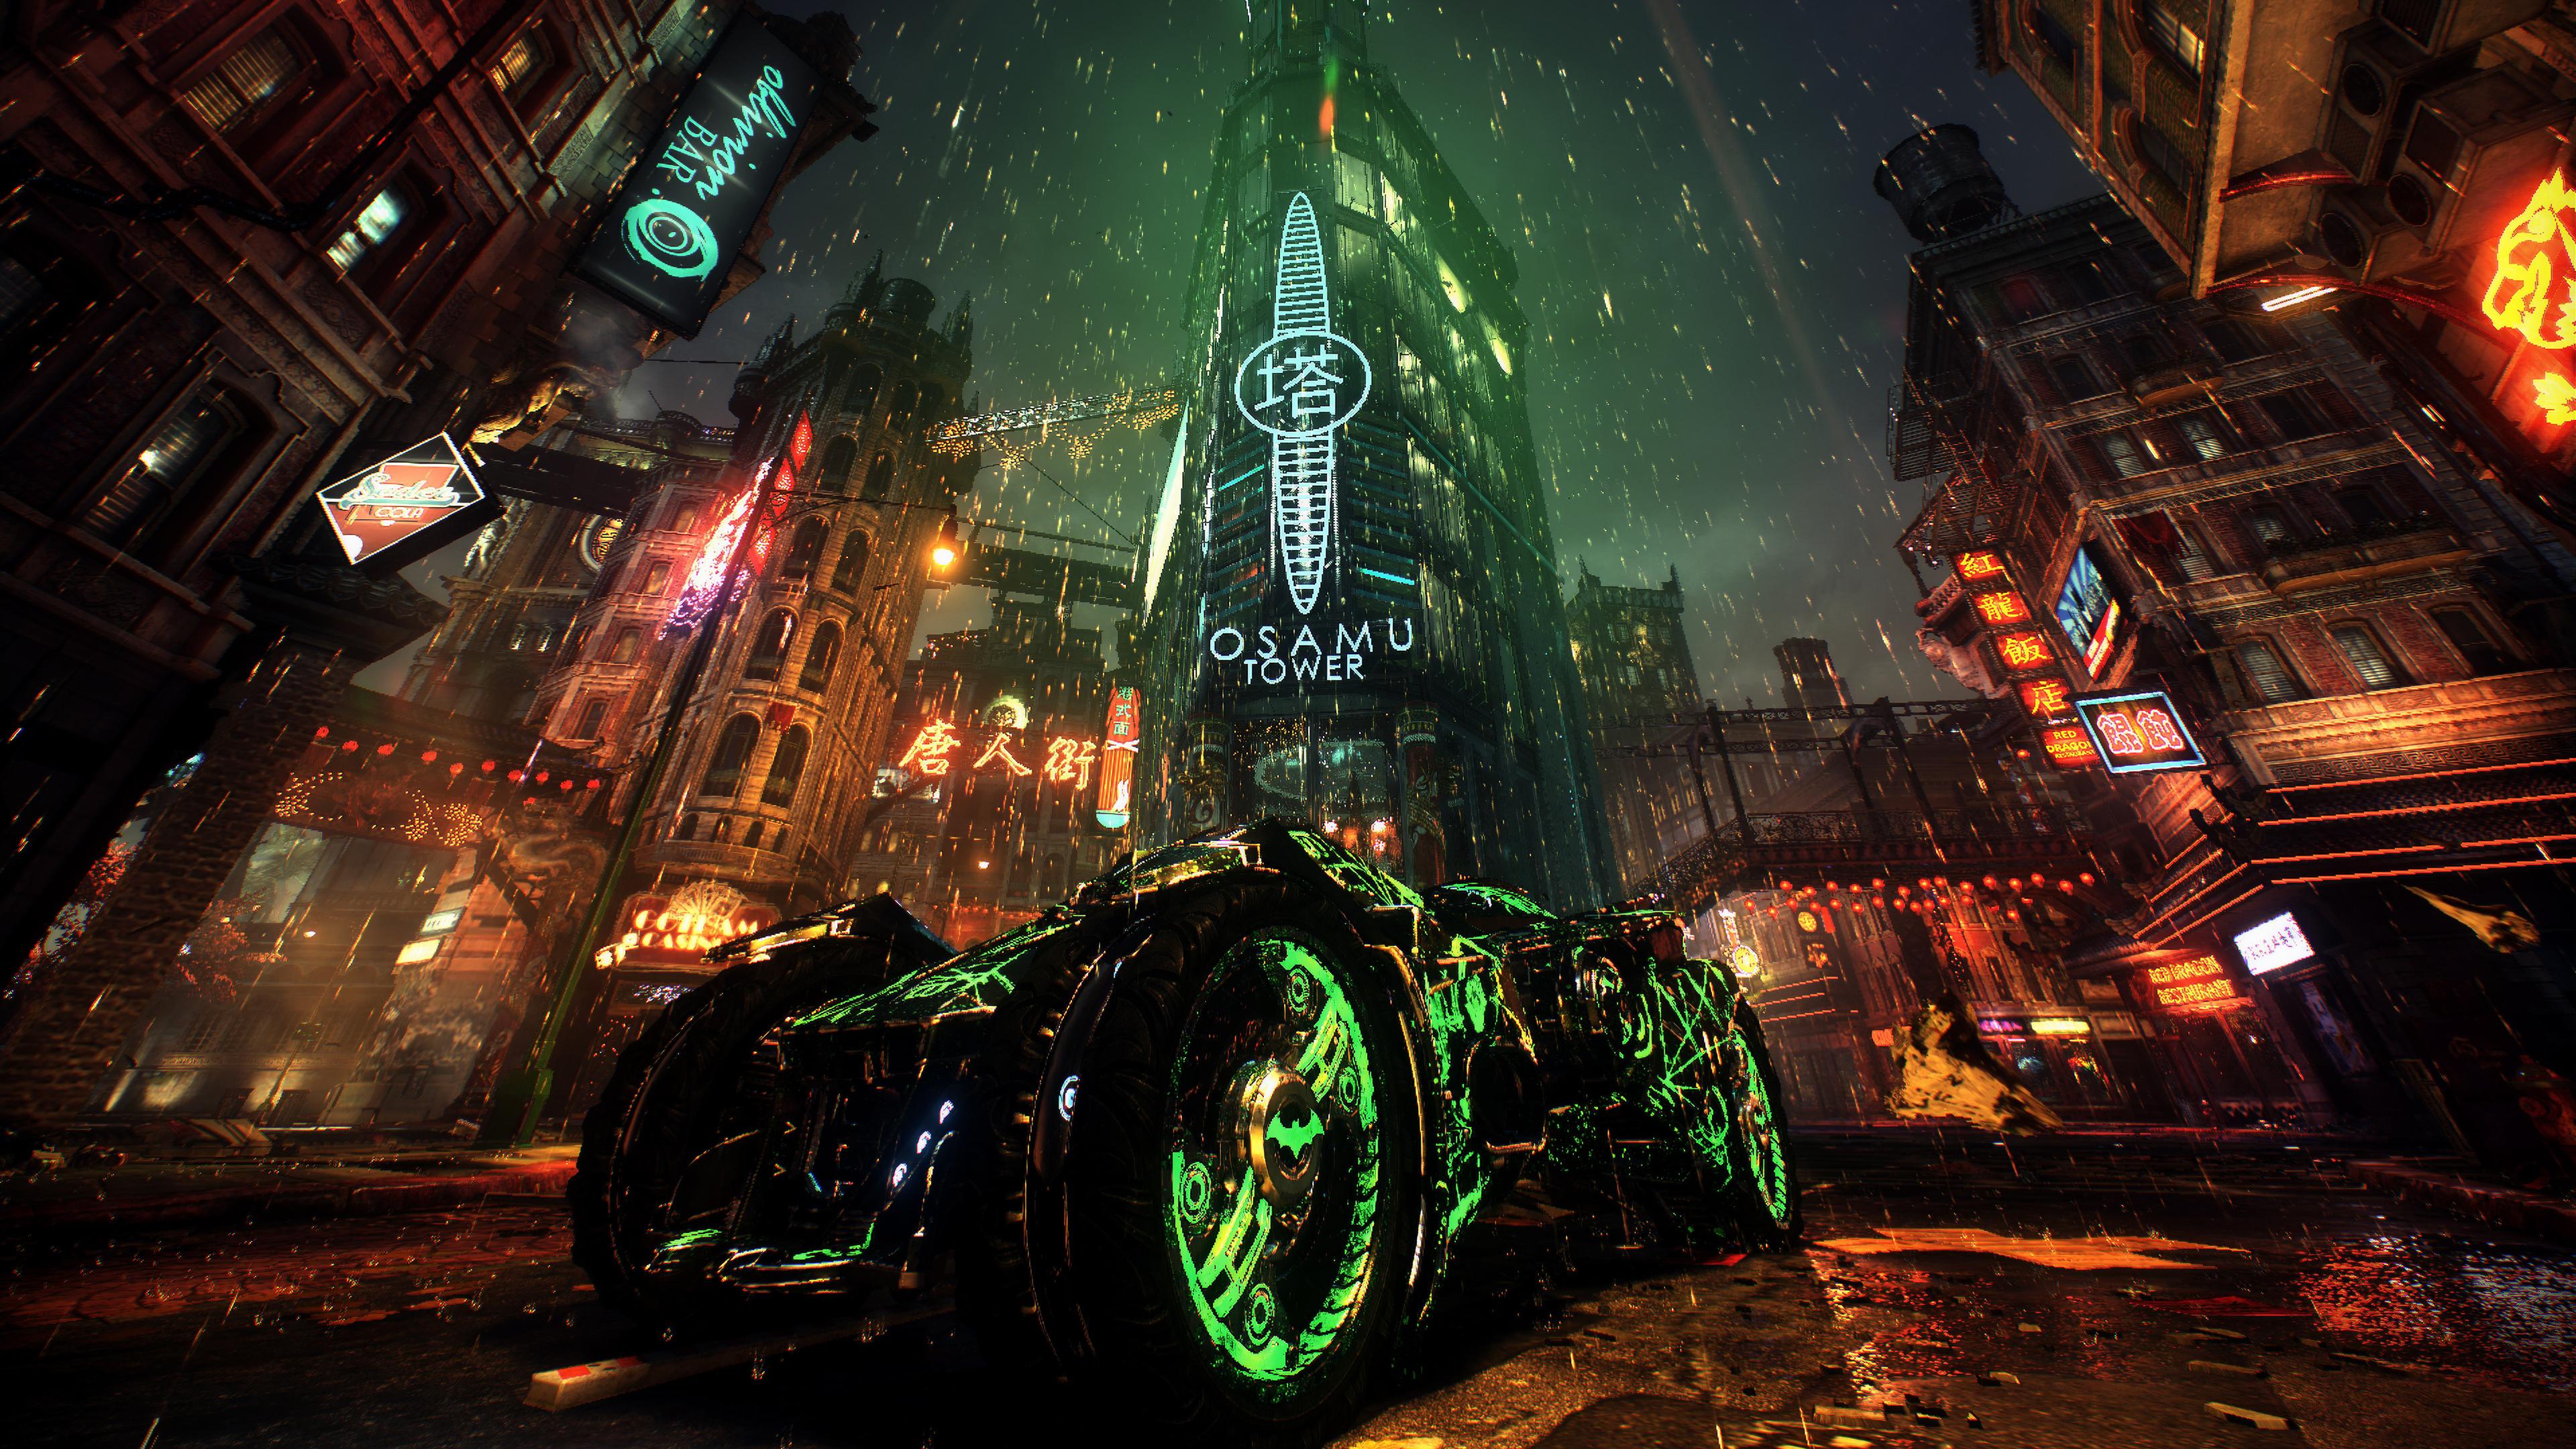 Batmobile Batman Arkham Knight 4k Hd Games 4k Wallpapers